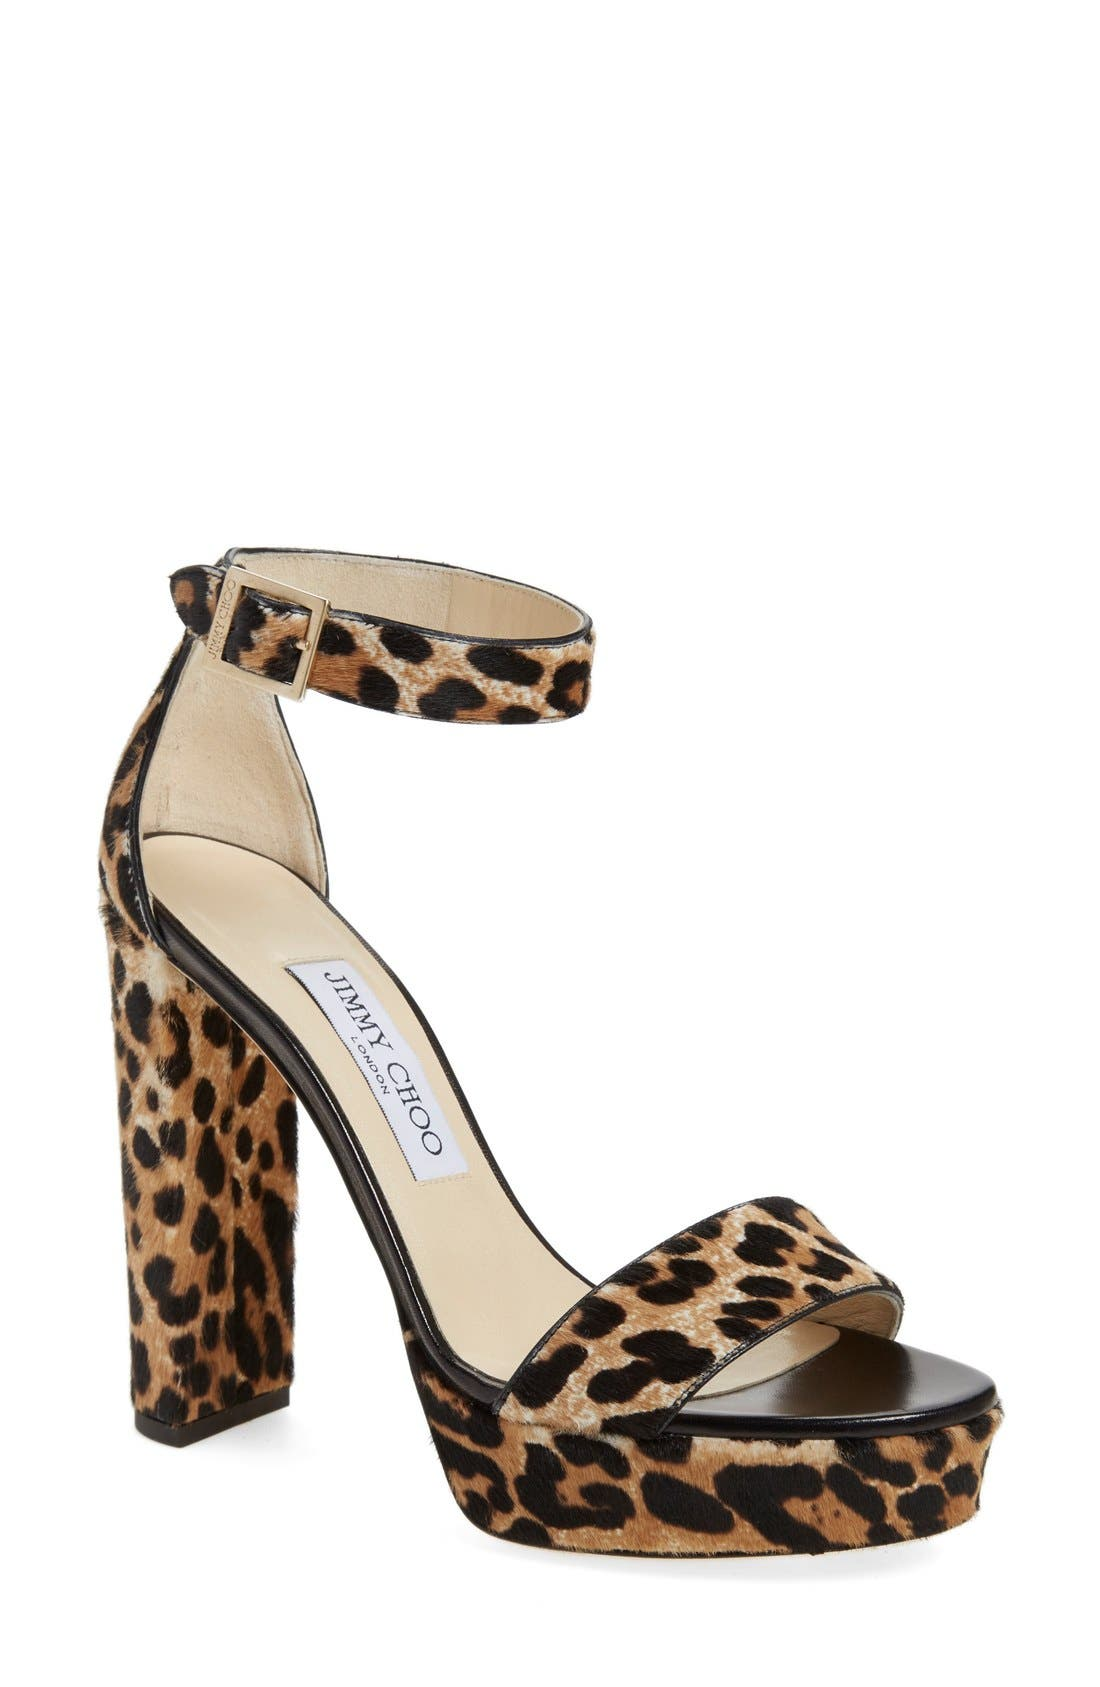 Alternate Image 1 Selected - Jimmy Choo 'Holly' Ankle Strap Sandal (Women)